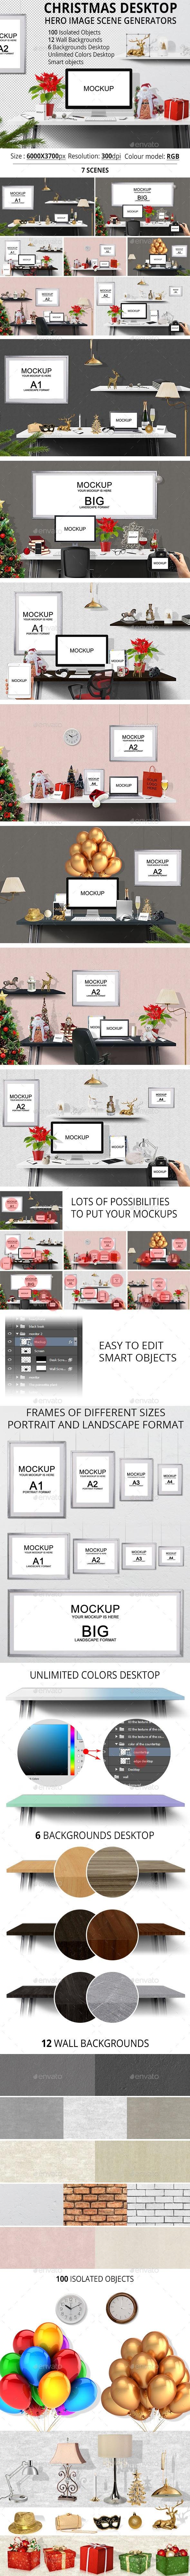 Christmas Desktop Hero Image Scene Generators - Hero Images Graphics